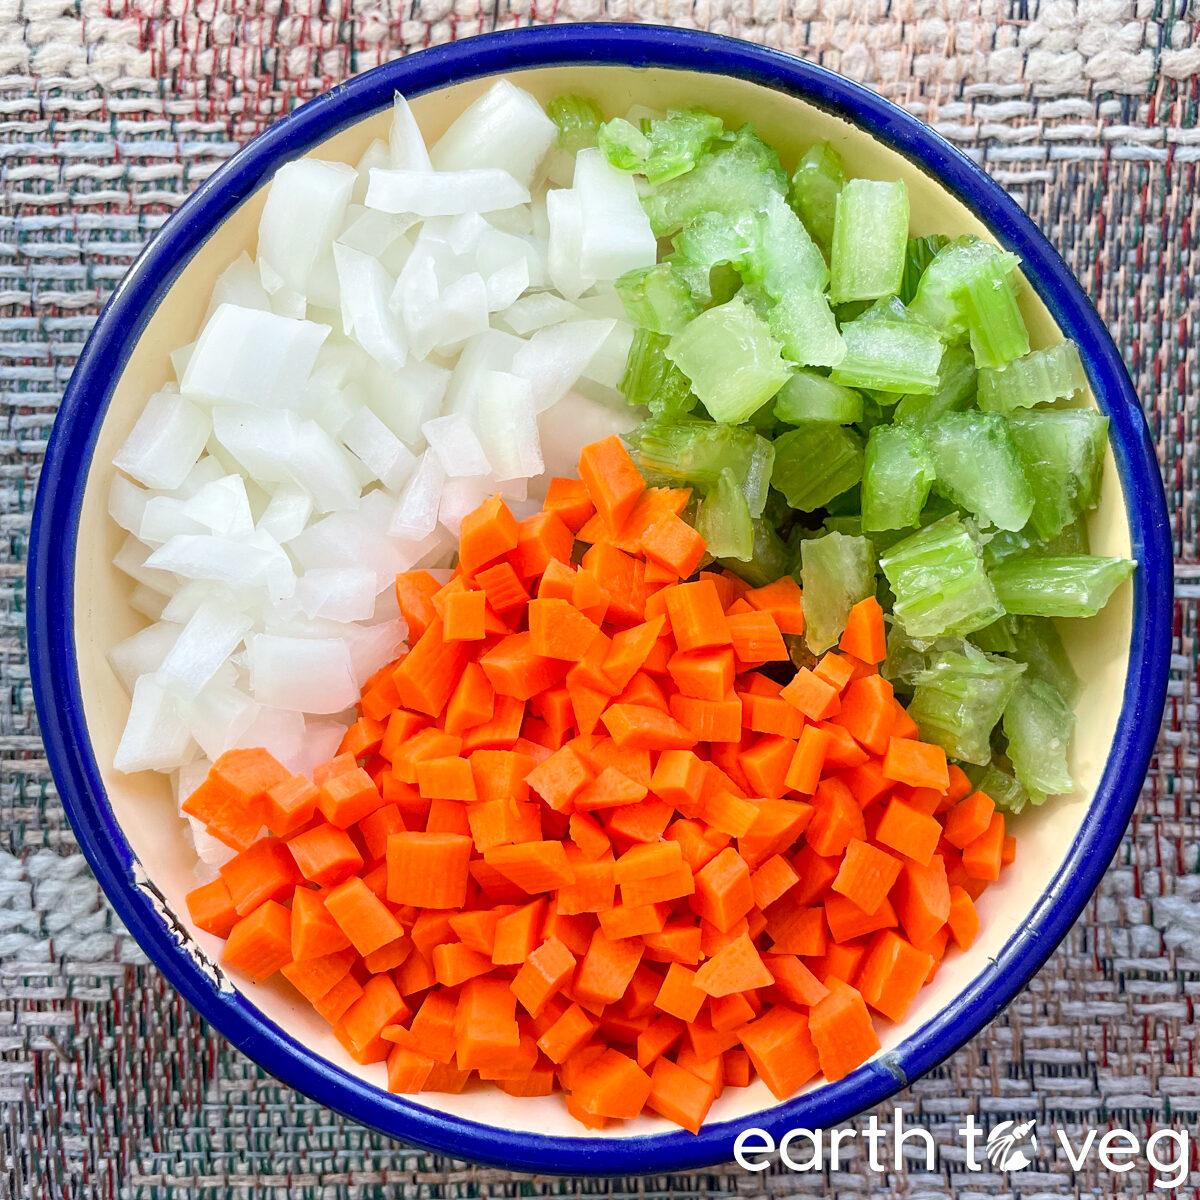 mirepoix ingredients (celery, onion, carrot)